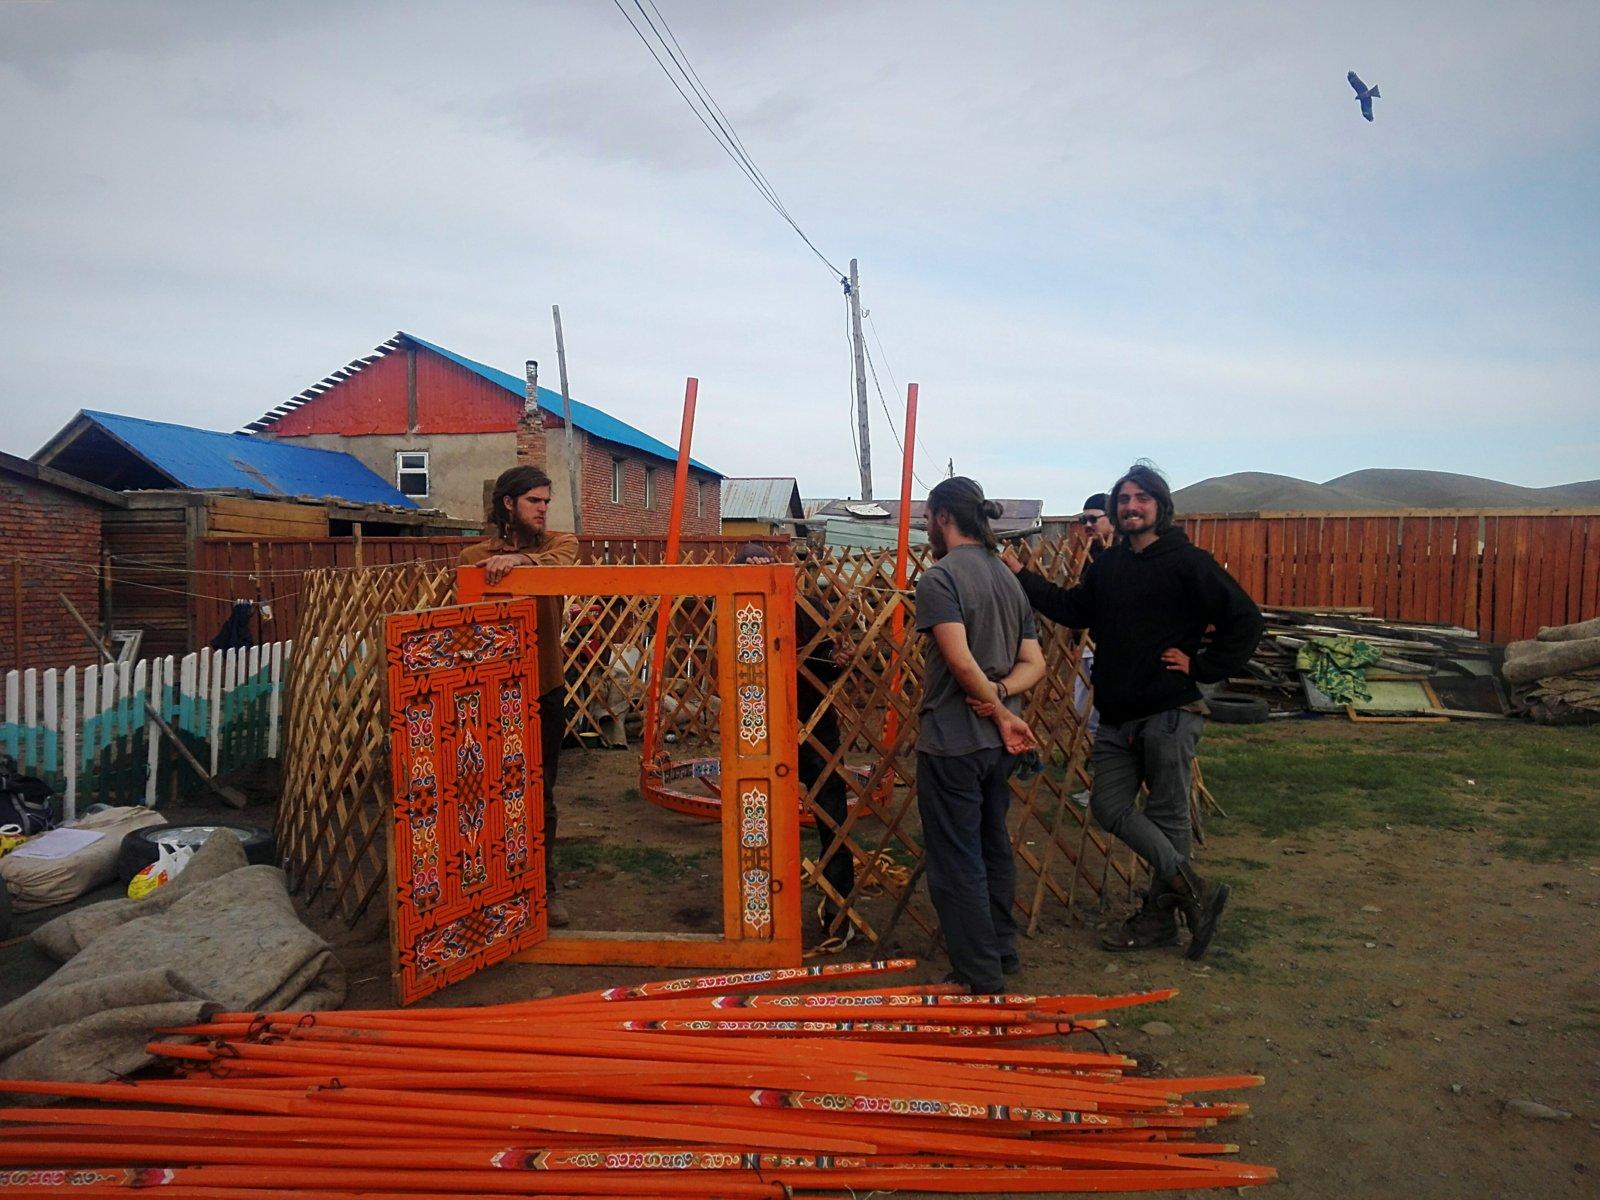 img_20160524_012940-jpg.30633_Mongolia Rainbow Horse Caravan_Travel Stories_Squat the Planet_4:14 AM